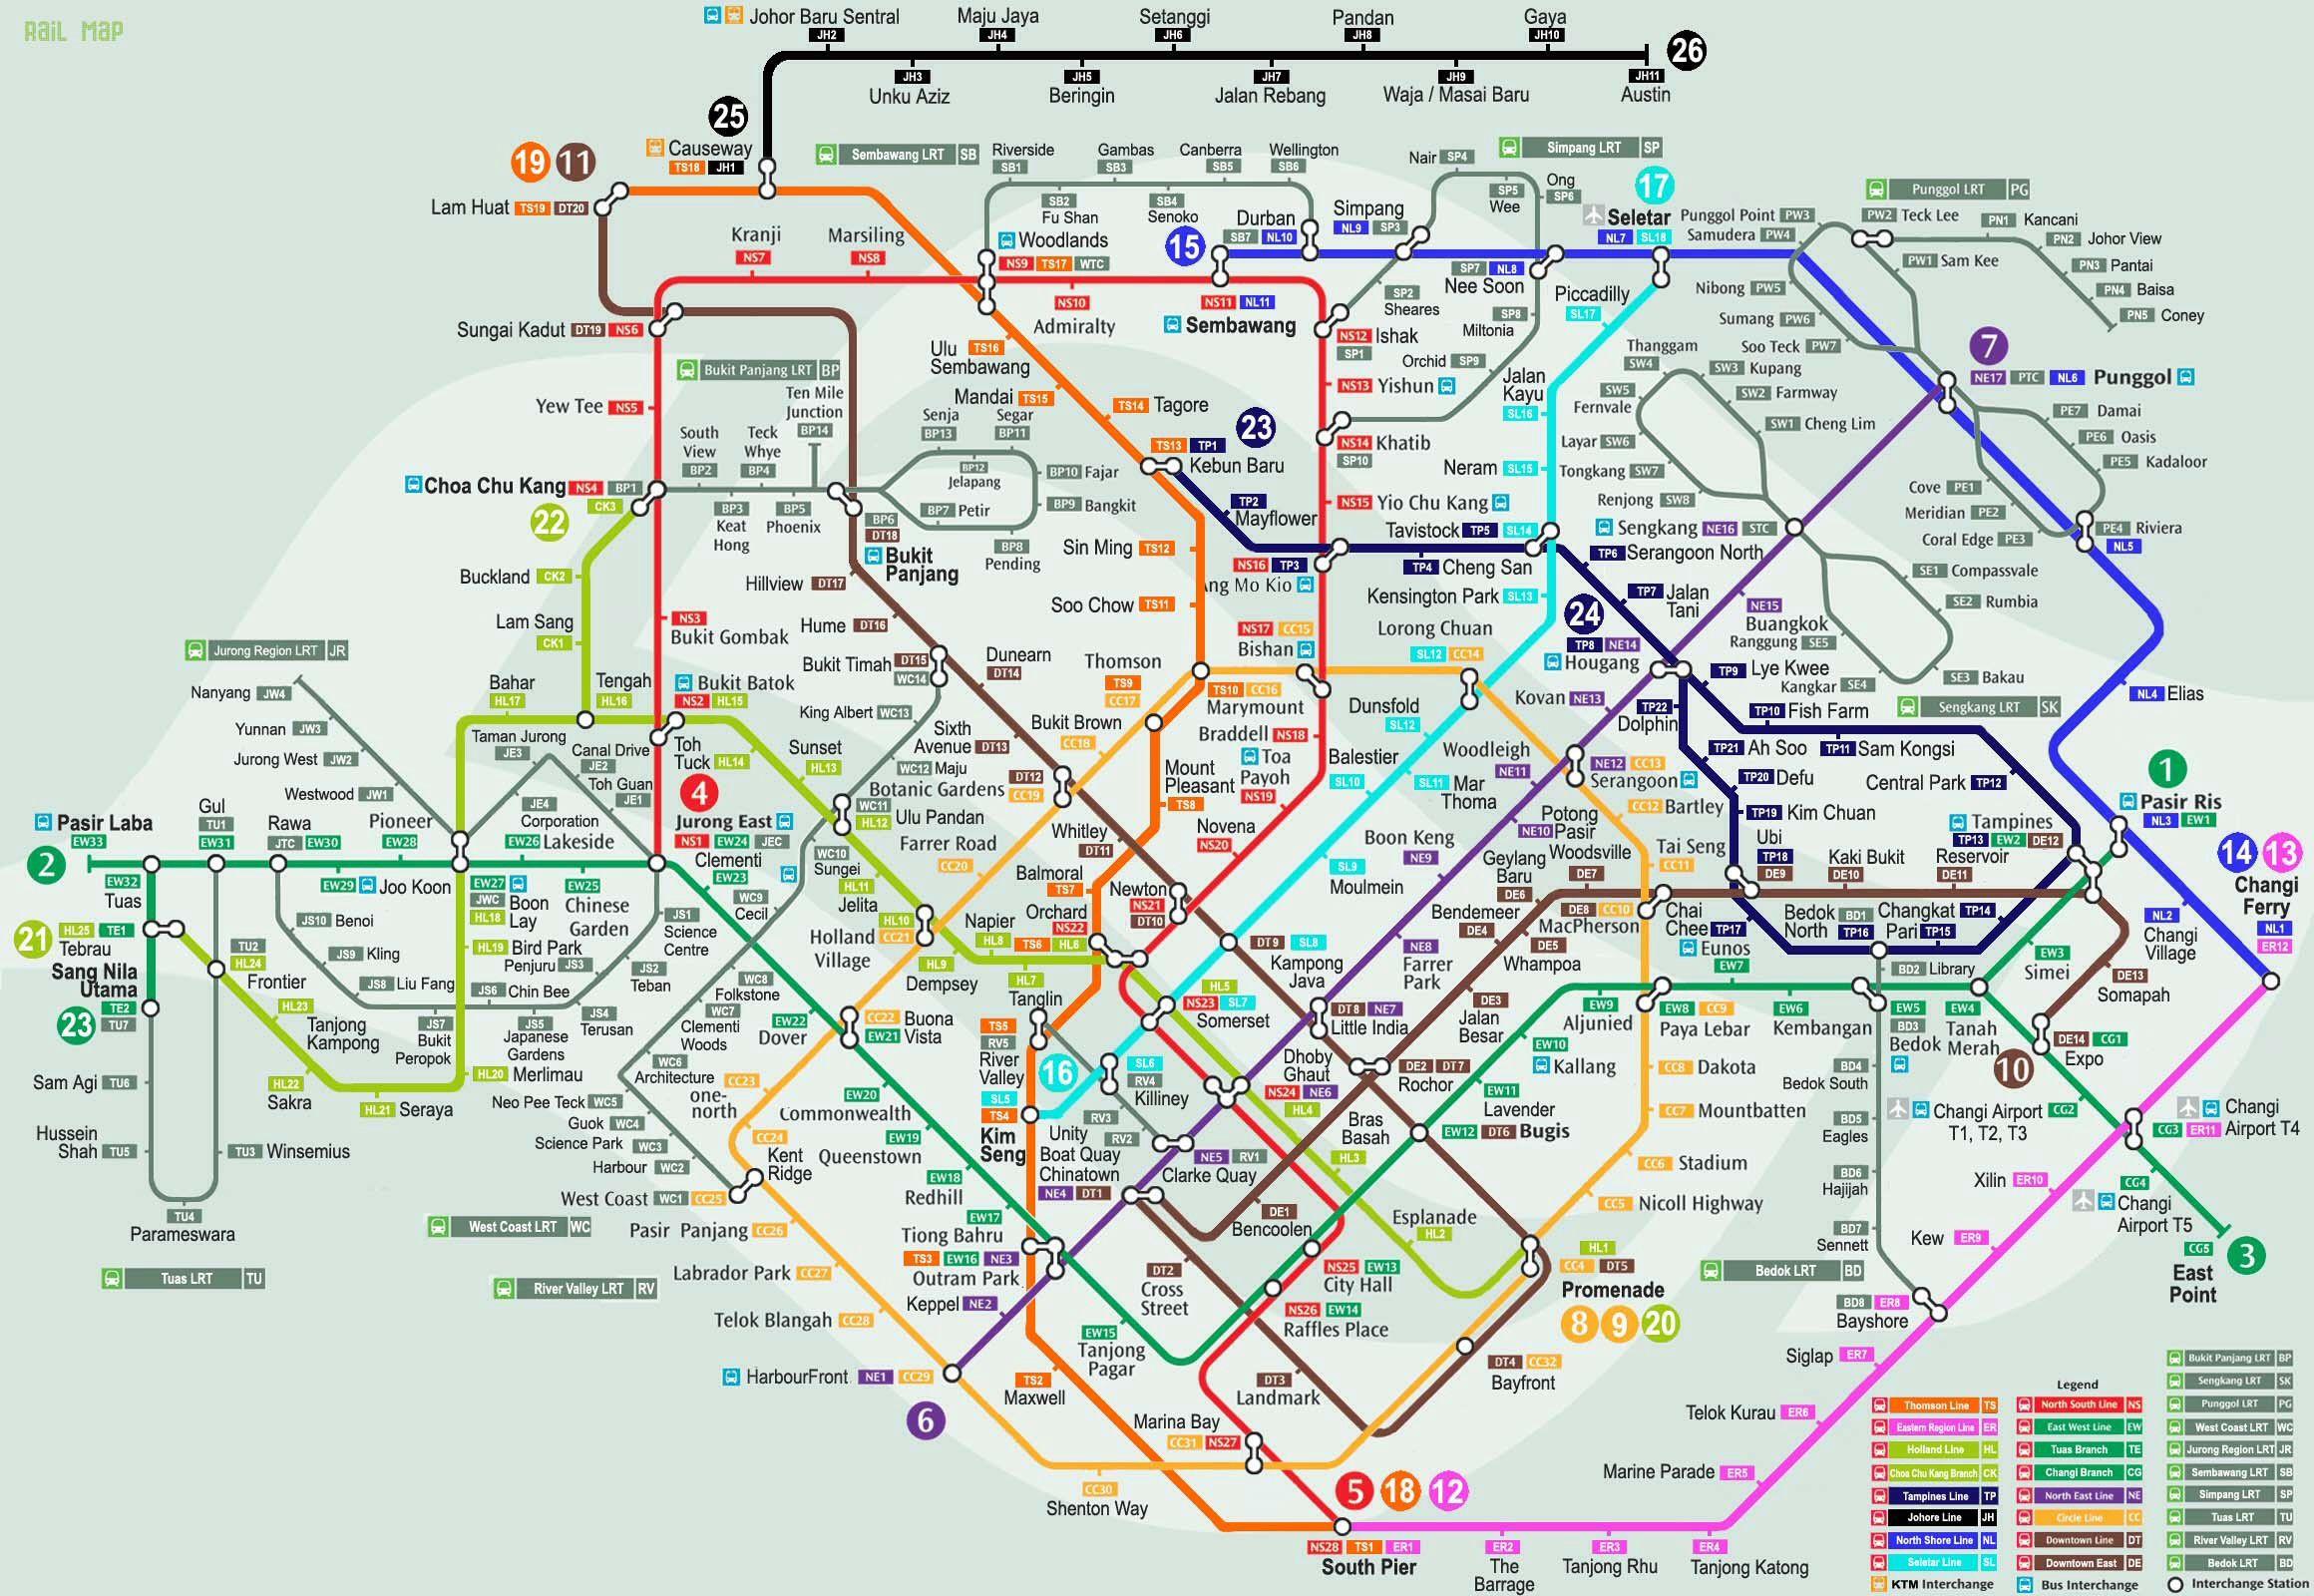 Singapore Mrt Map Traveling Singapore Map Singapore Map